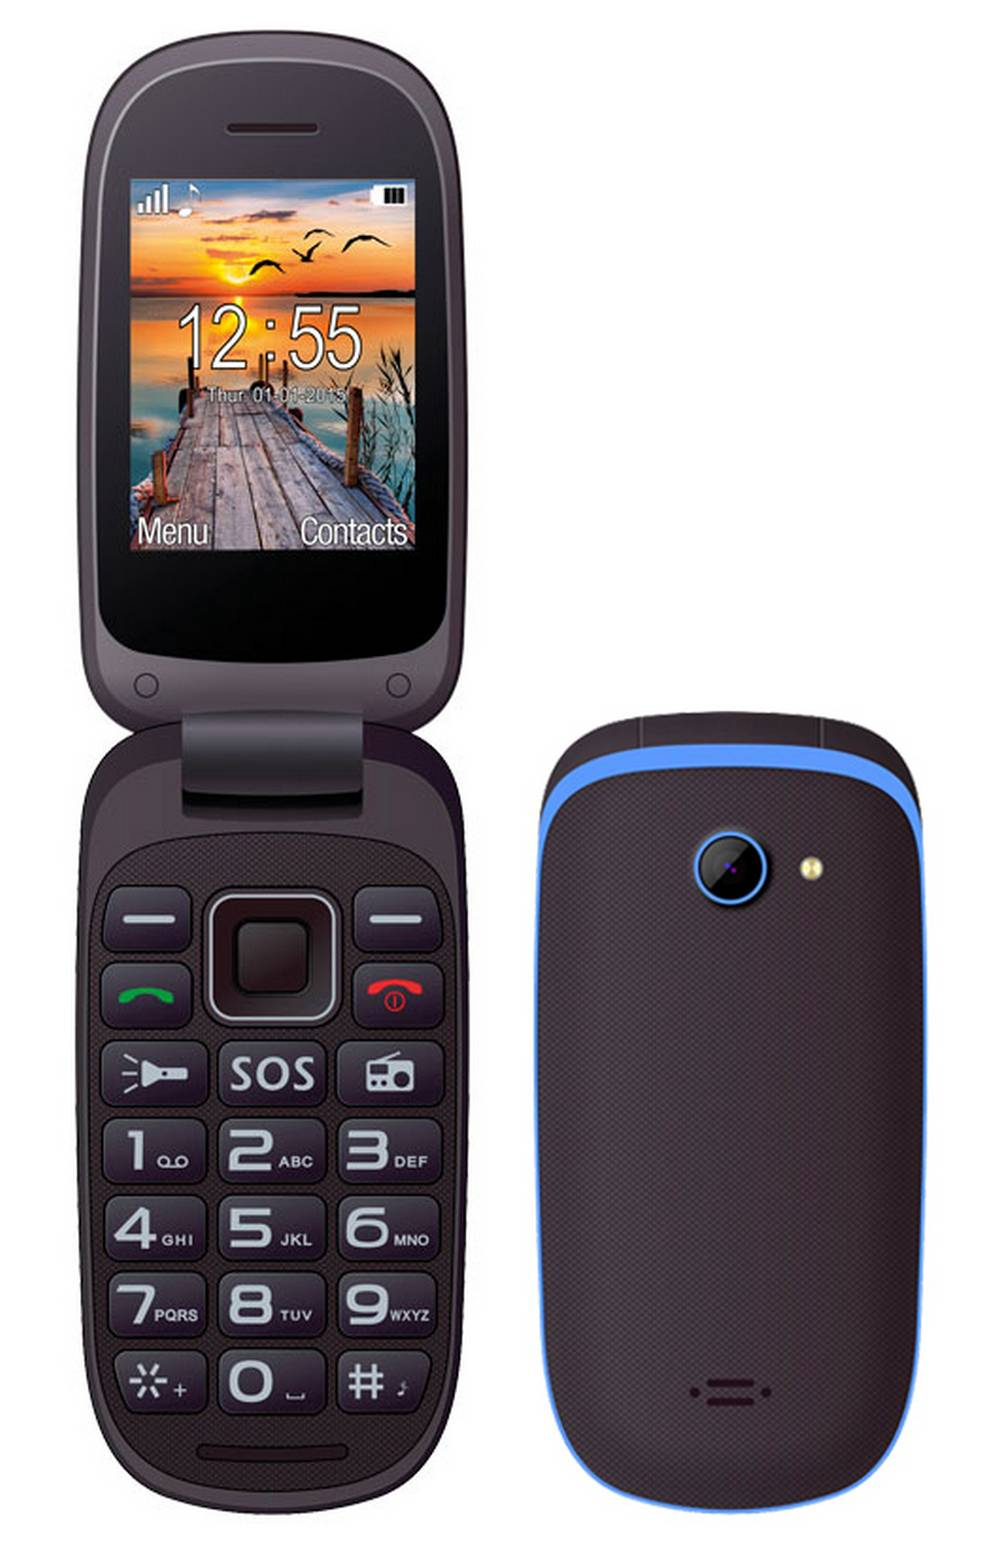 Maxcom MM818 (Dual Sim) με Μεγάλα Πλήκτρα, Ραδιόφωνο (Λειτουργεί χωρίς Handsfree) και Πλήκτρο Έκτακτης Ανάγκης Μαύρο-Μπλέ